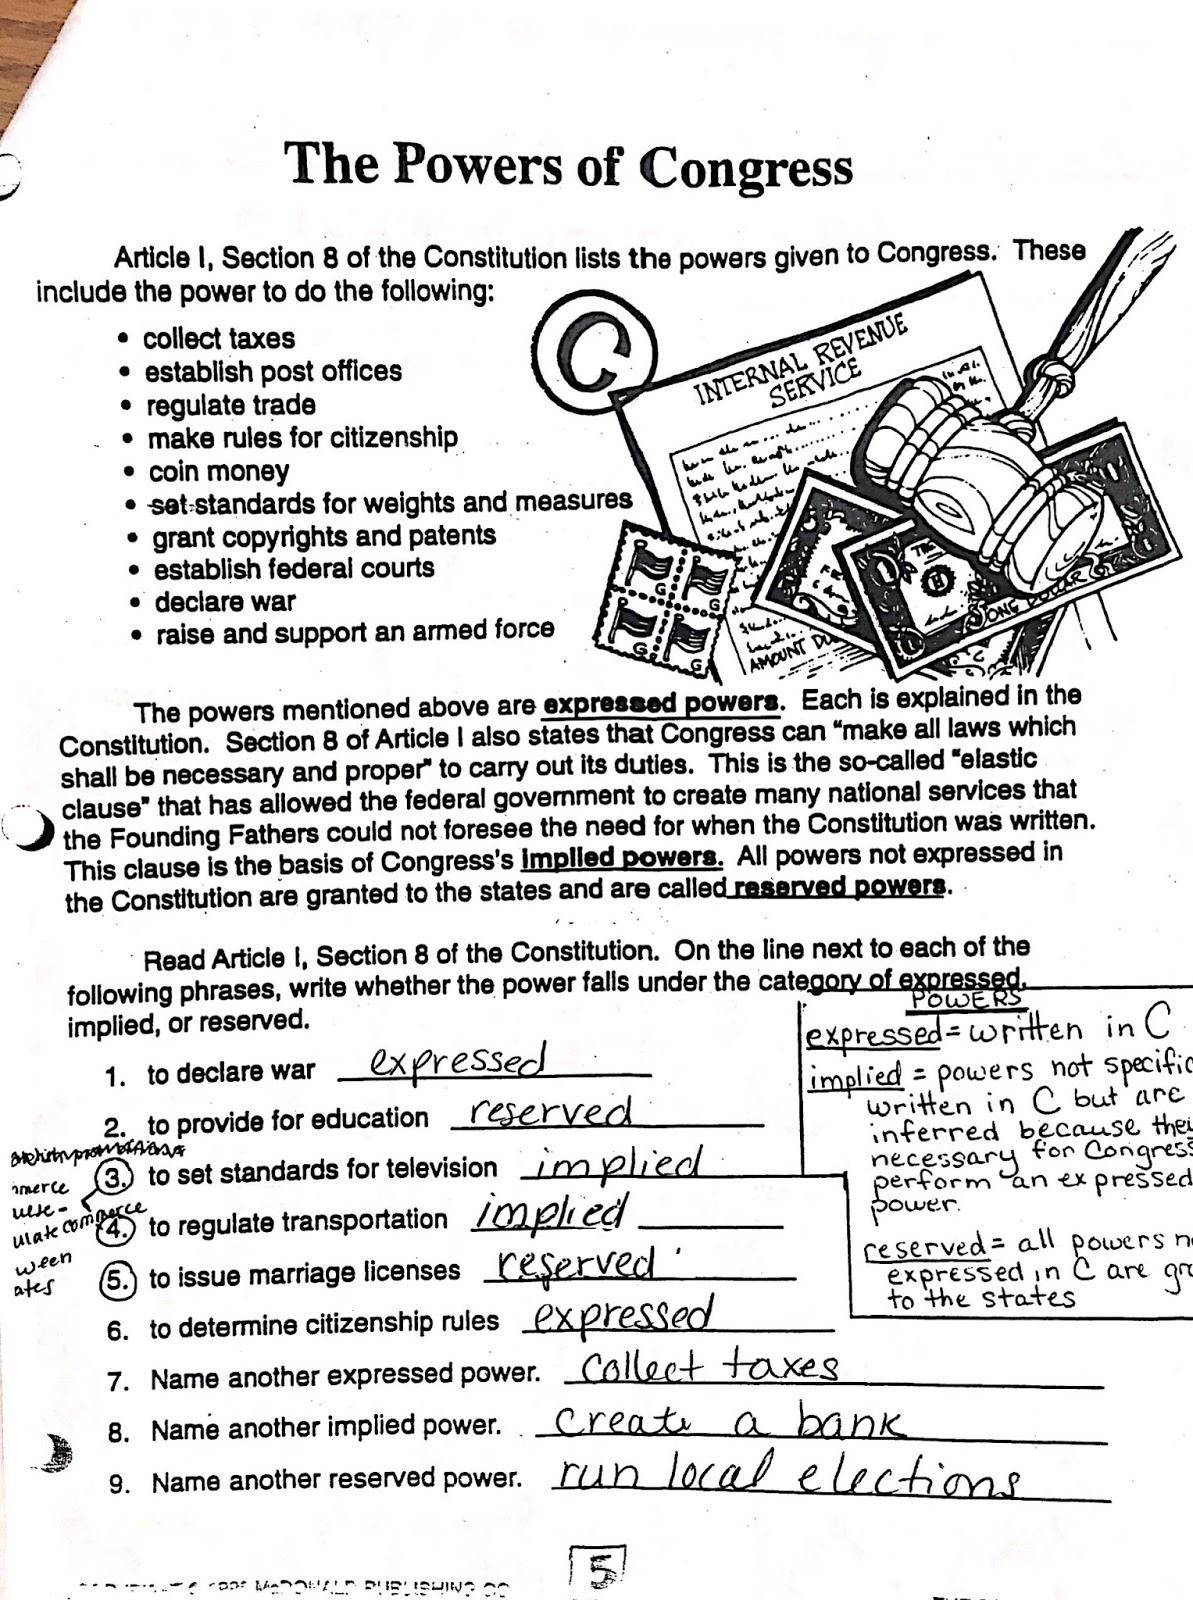 Mr. Deshler's Classroom: Legislative Branch Packet Answers